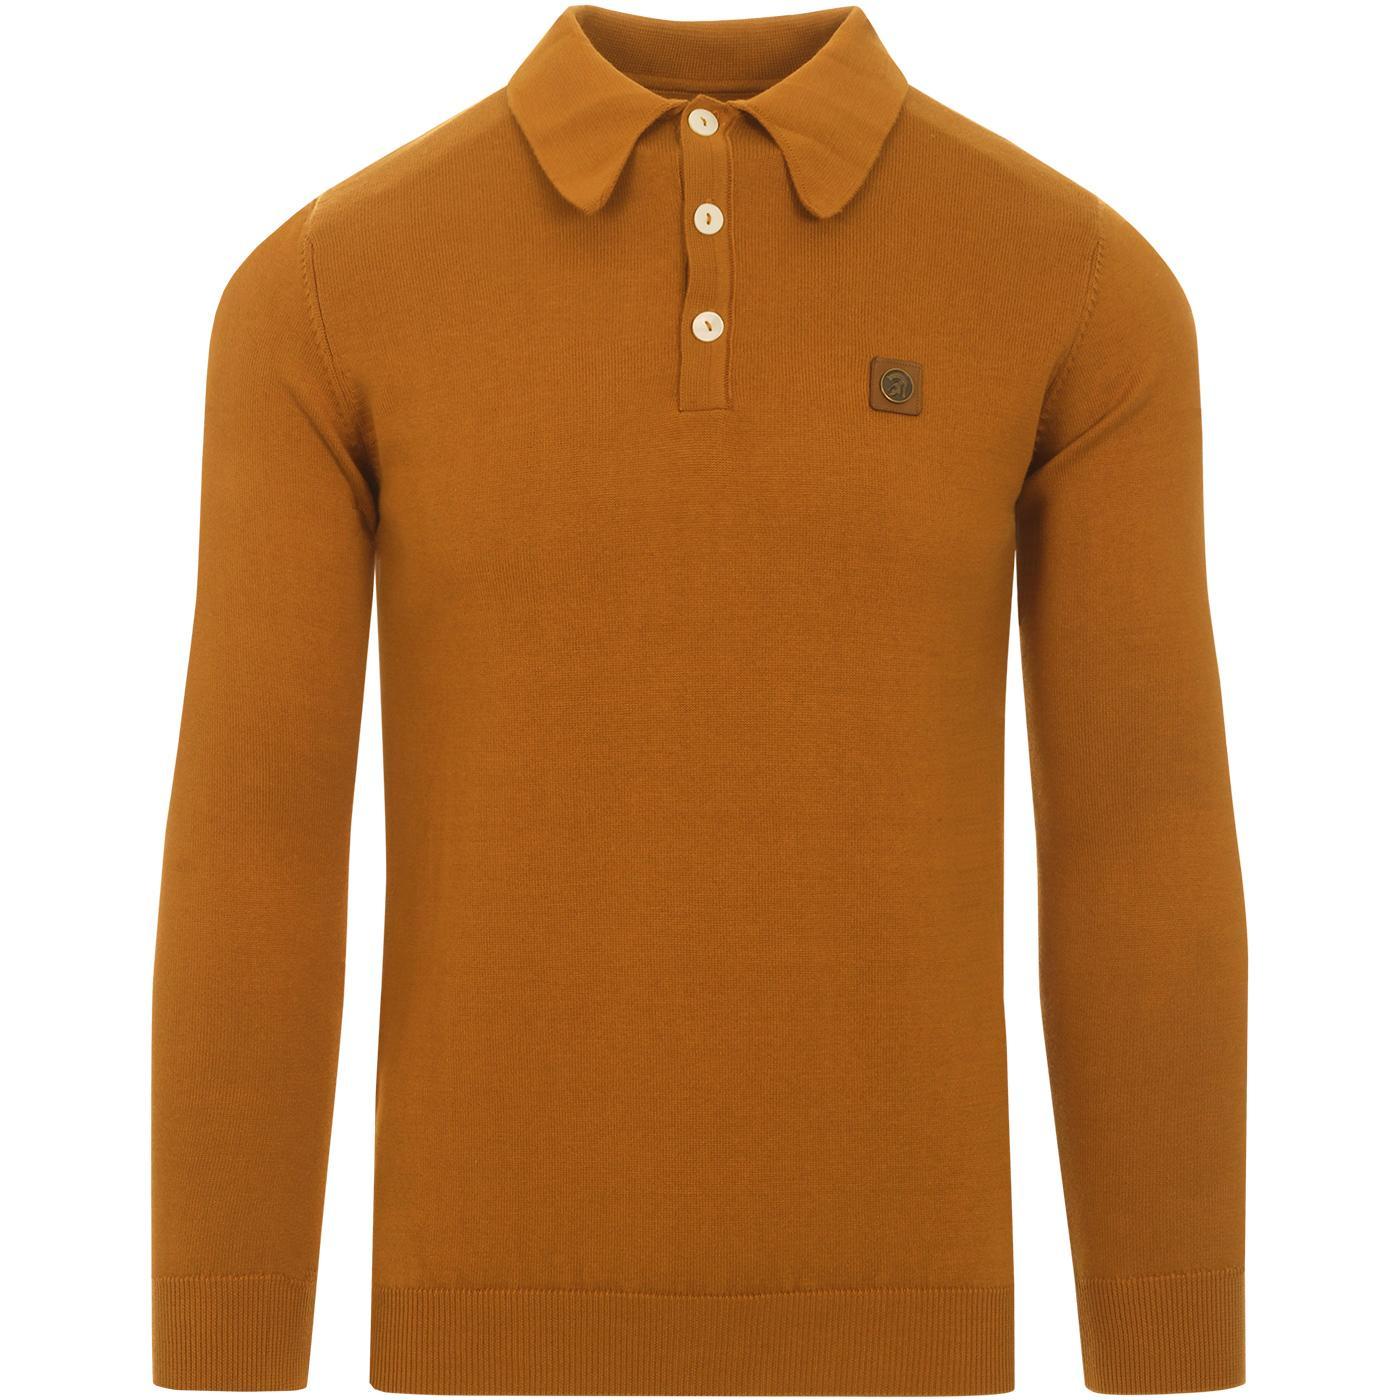 TROJAN RECORDS Men's Mod Knitted Polo Shirt (Tan)